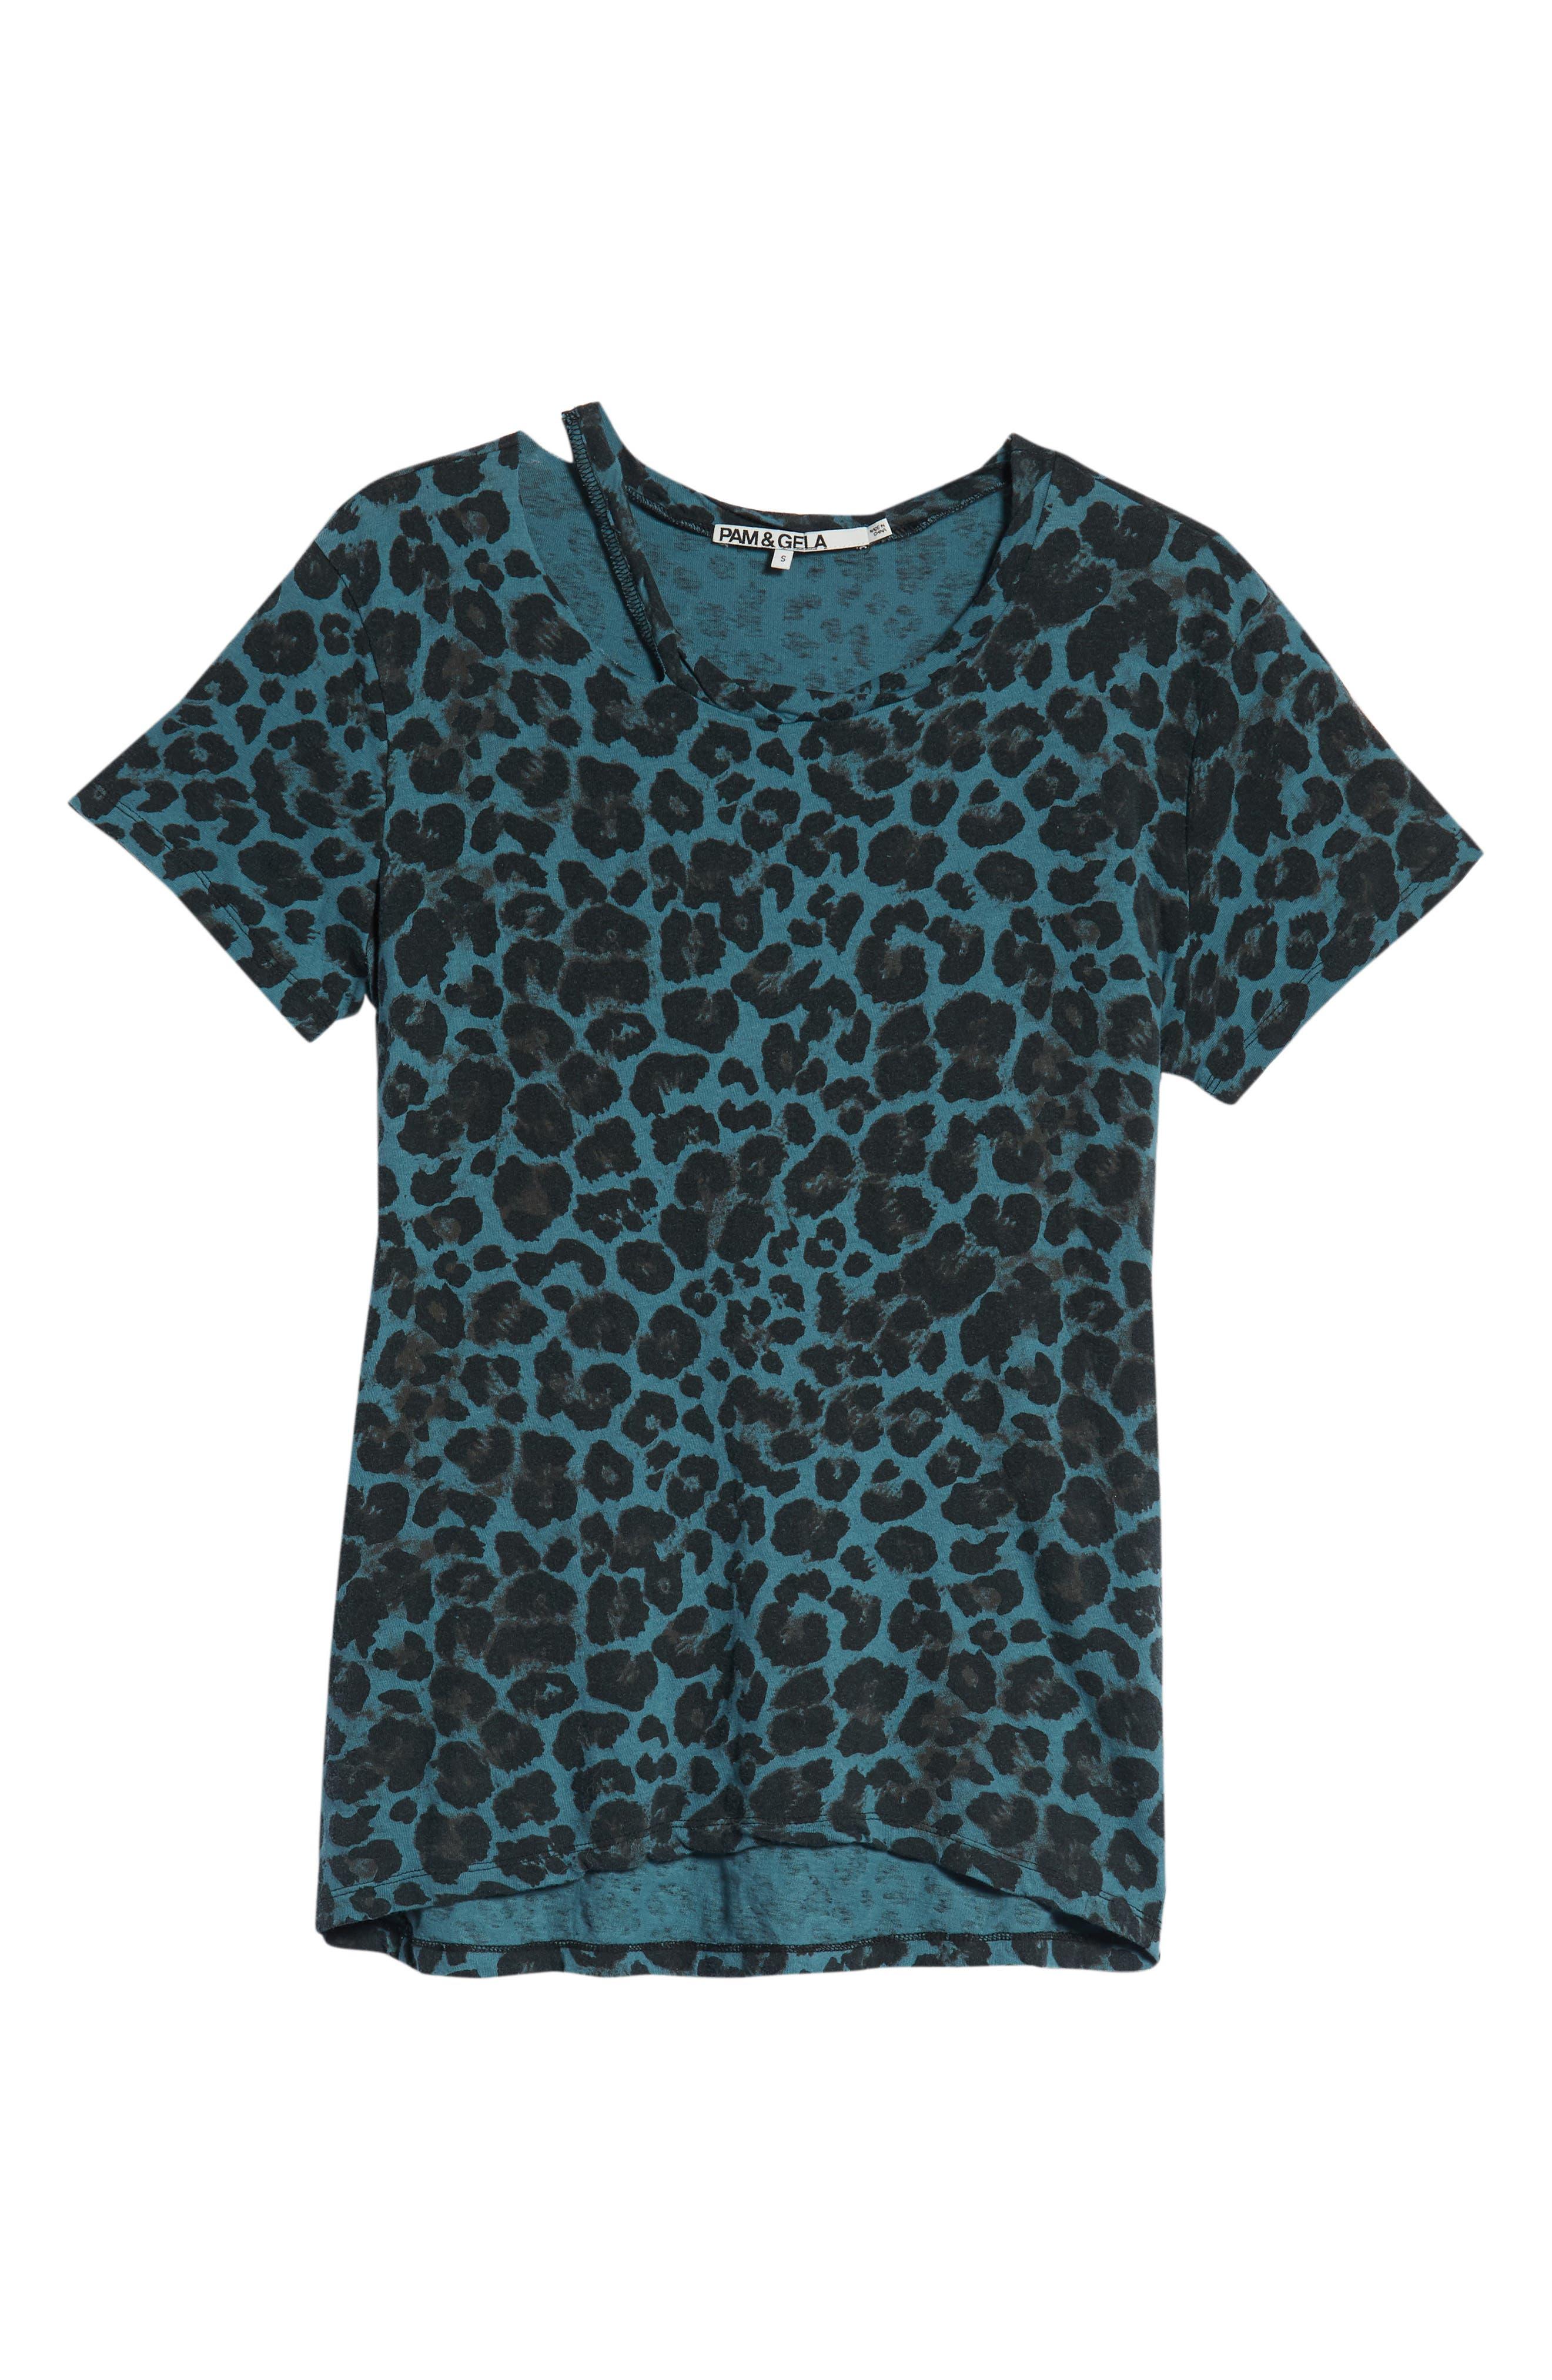 Leopard Print Cutout Tee,                             Alternate thumbnail 6, color,                             BLUE LEOPARD PRINT